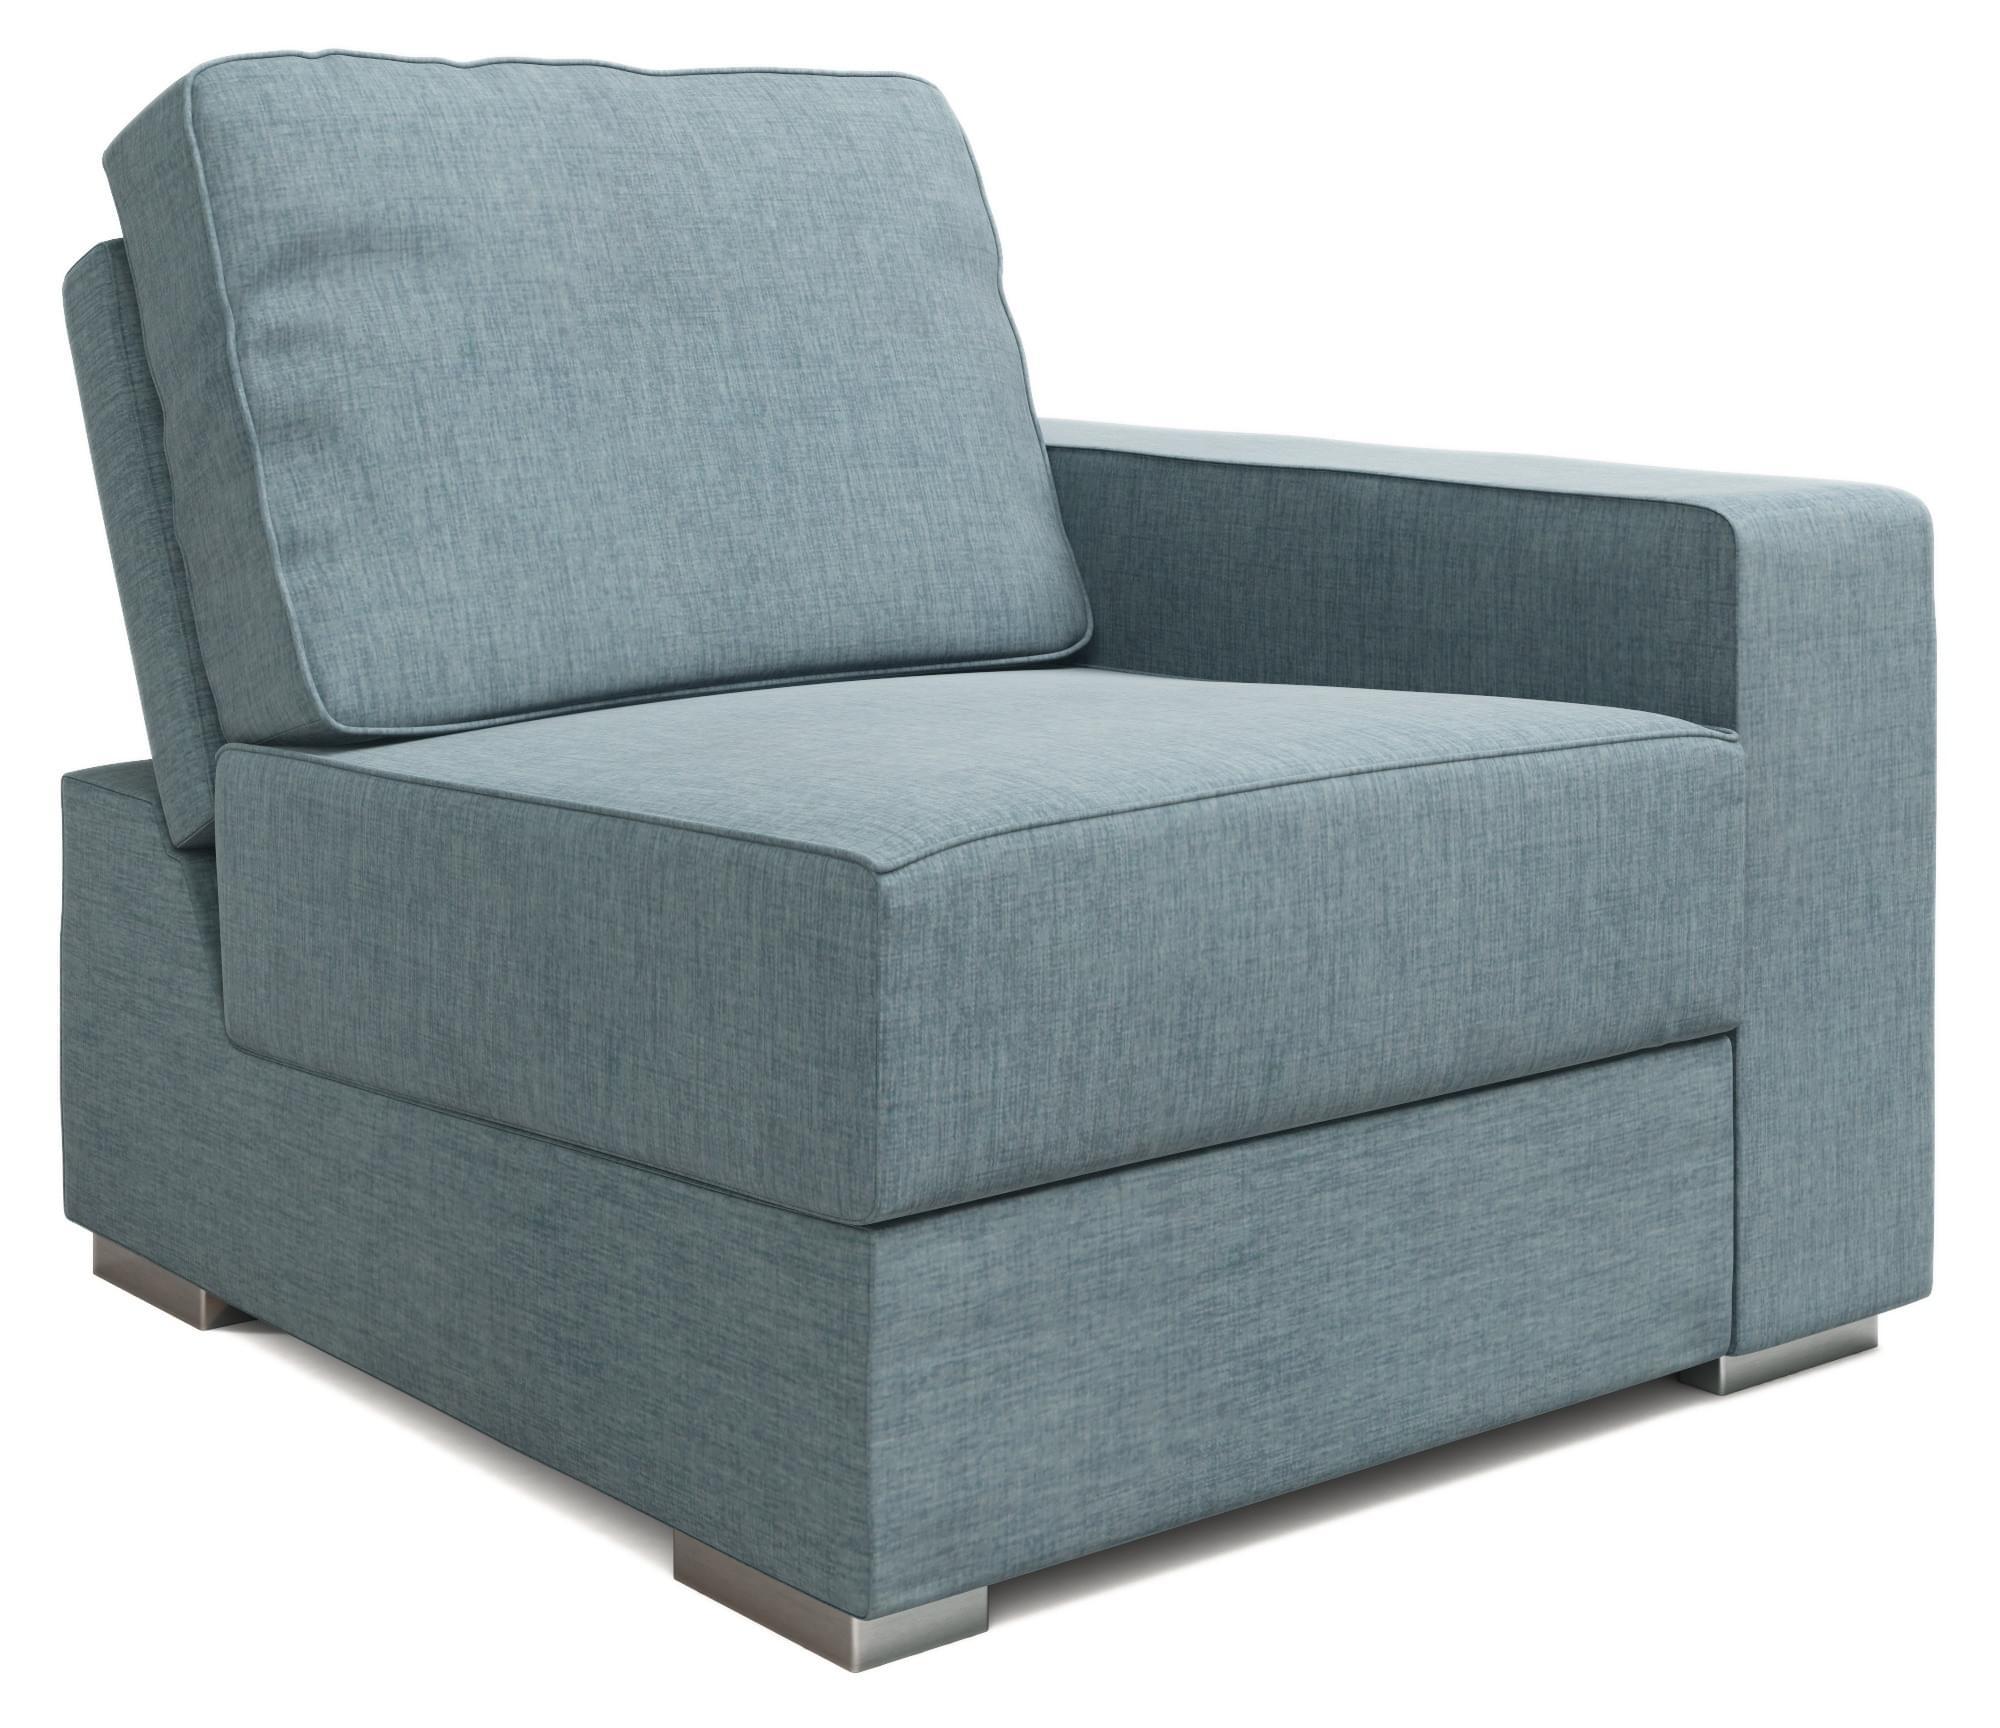 armless chair uk sash alternatives alda armchair medium sized nabru